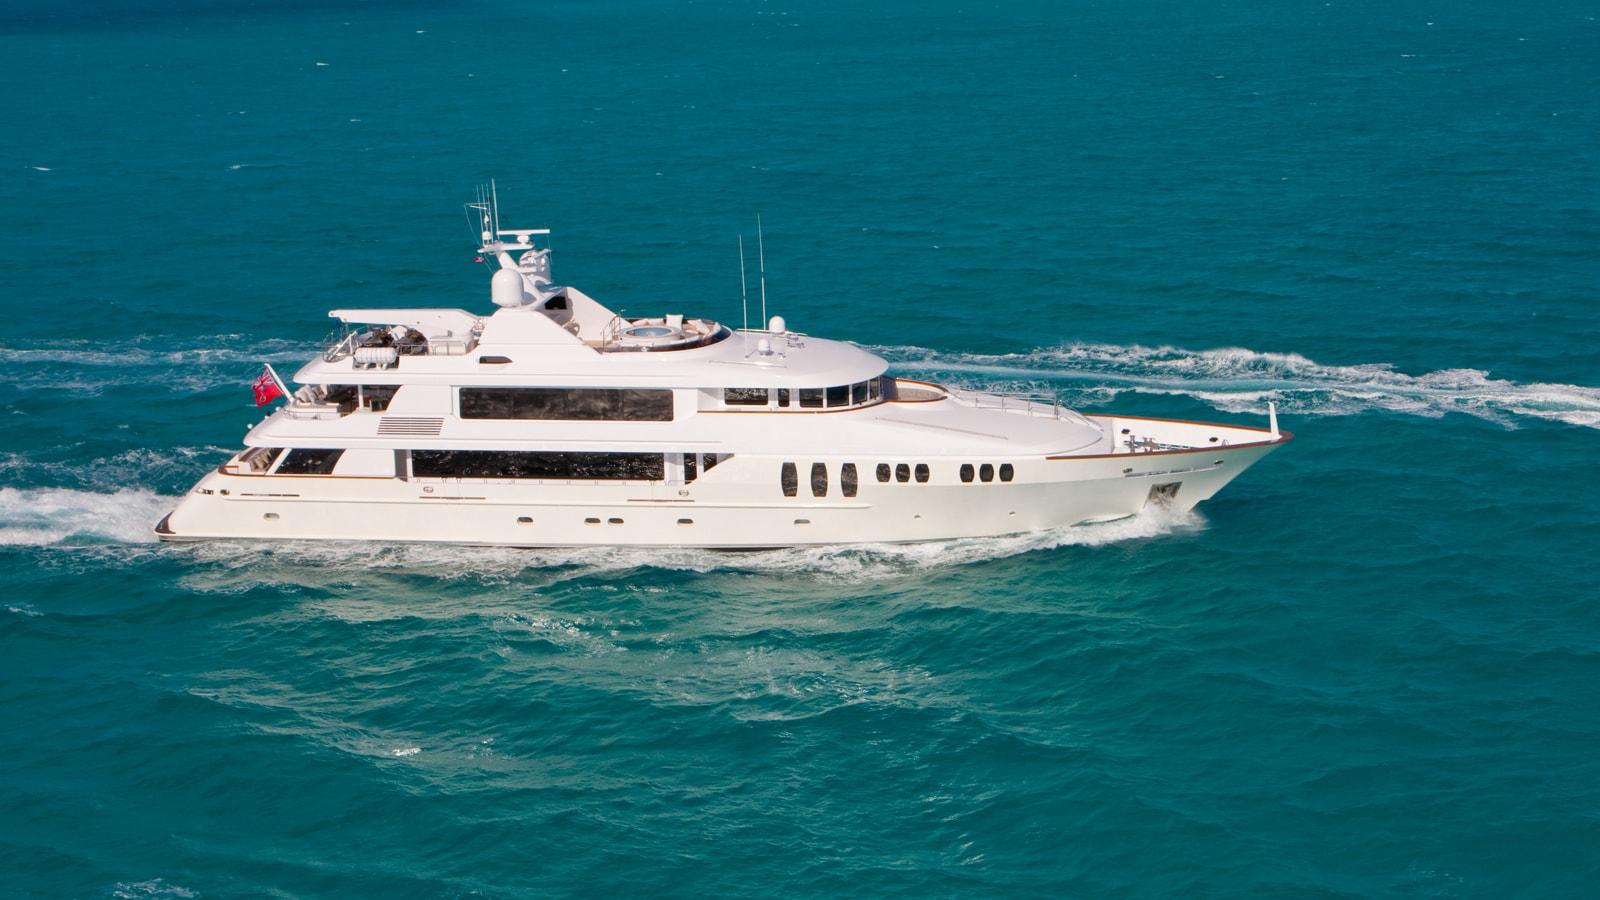 CARPE DIEM II Yacht Charter - IYC